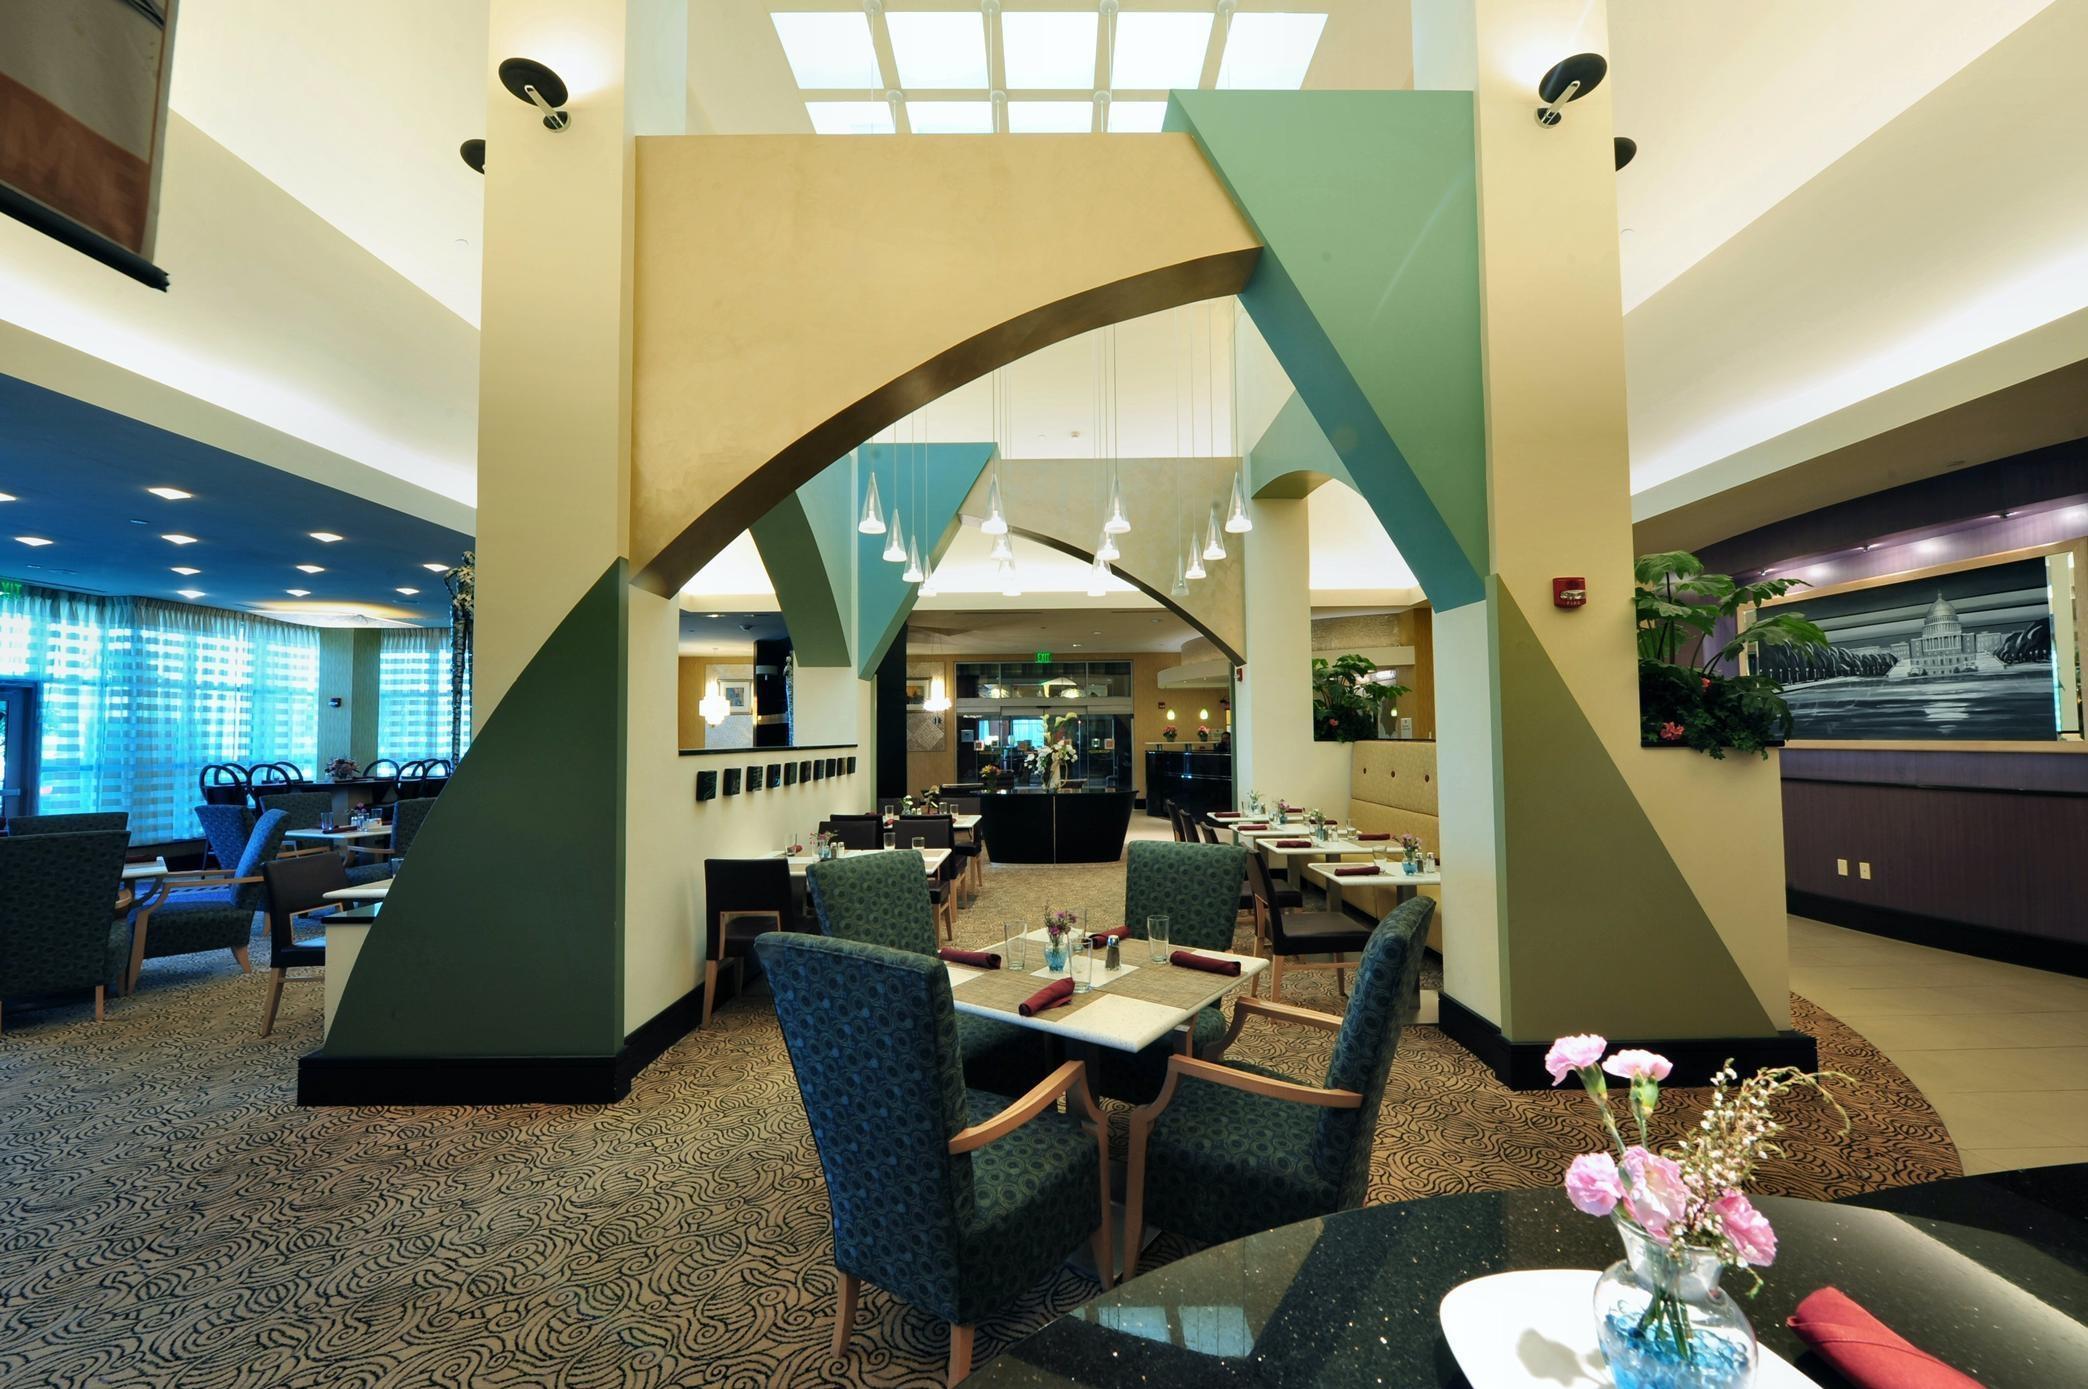 Hilton Garden Inn Rockville-Gaithersburg image 3